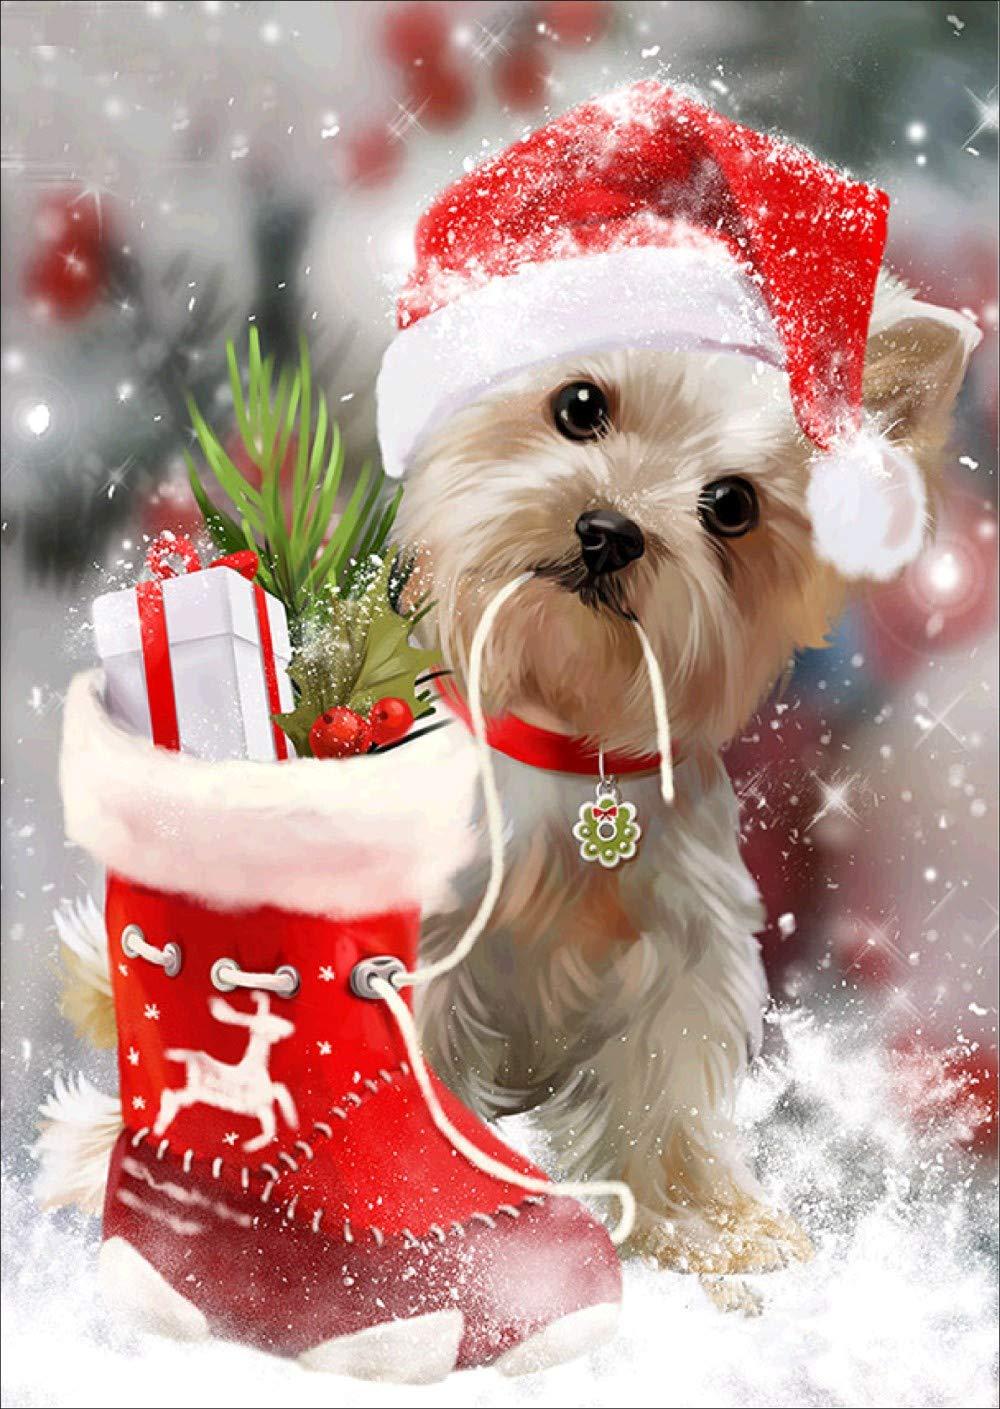 Yalehabi 5D diamond painting Christmas puppy embroidery DIY cross stitch home decoration